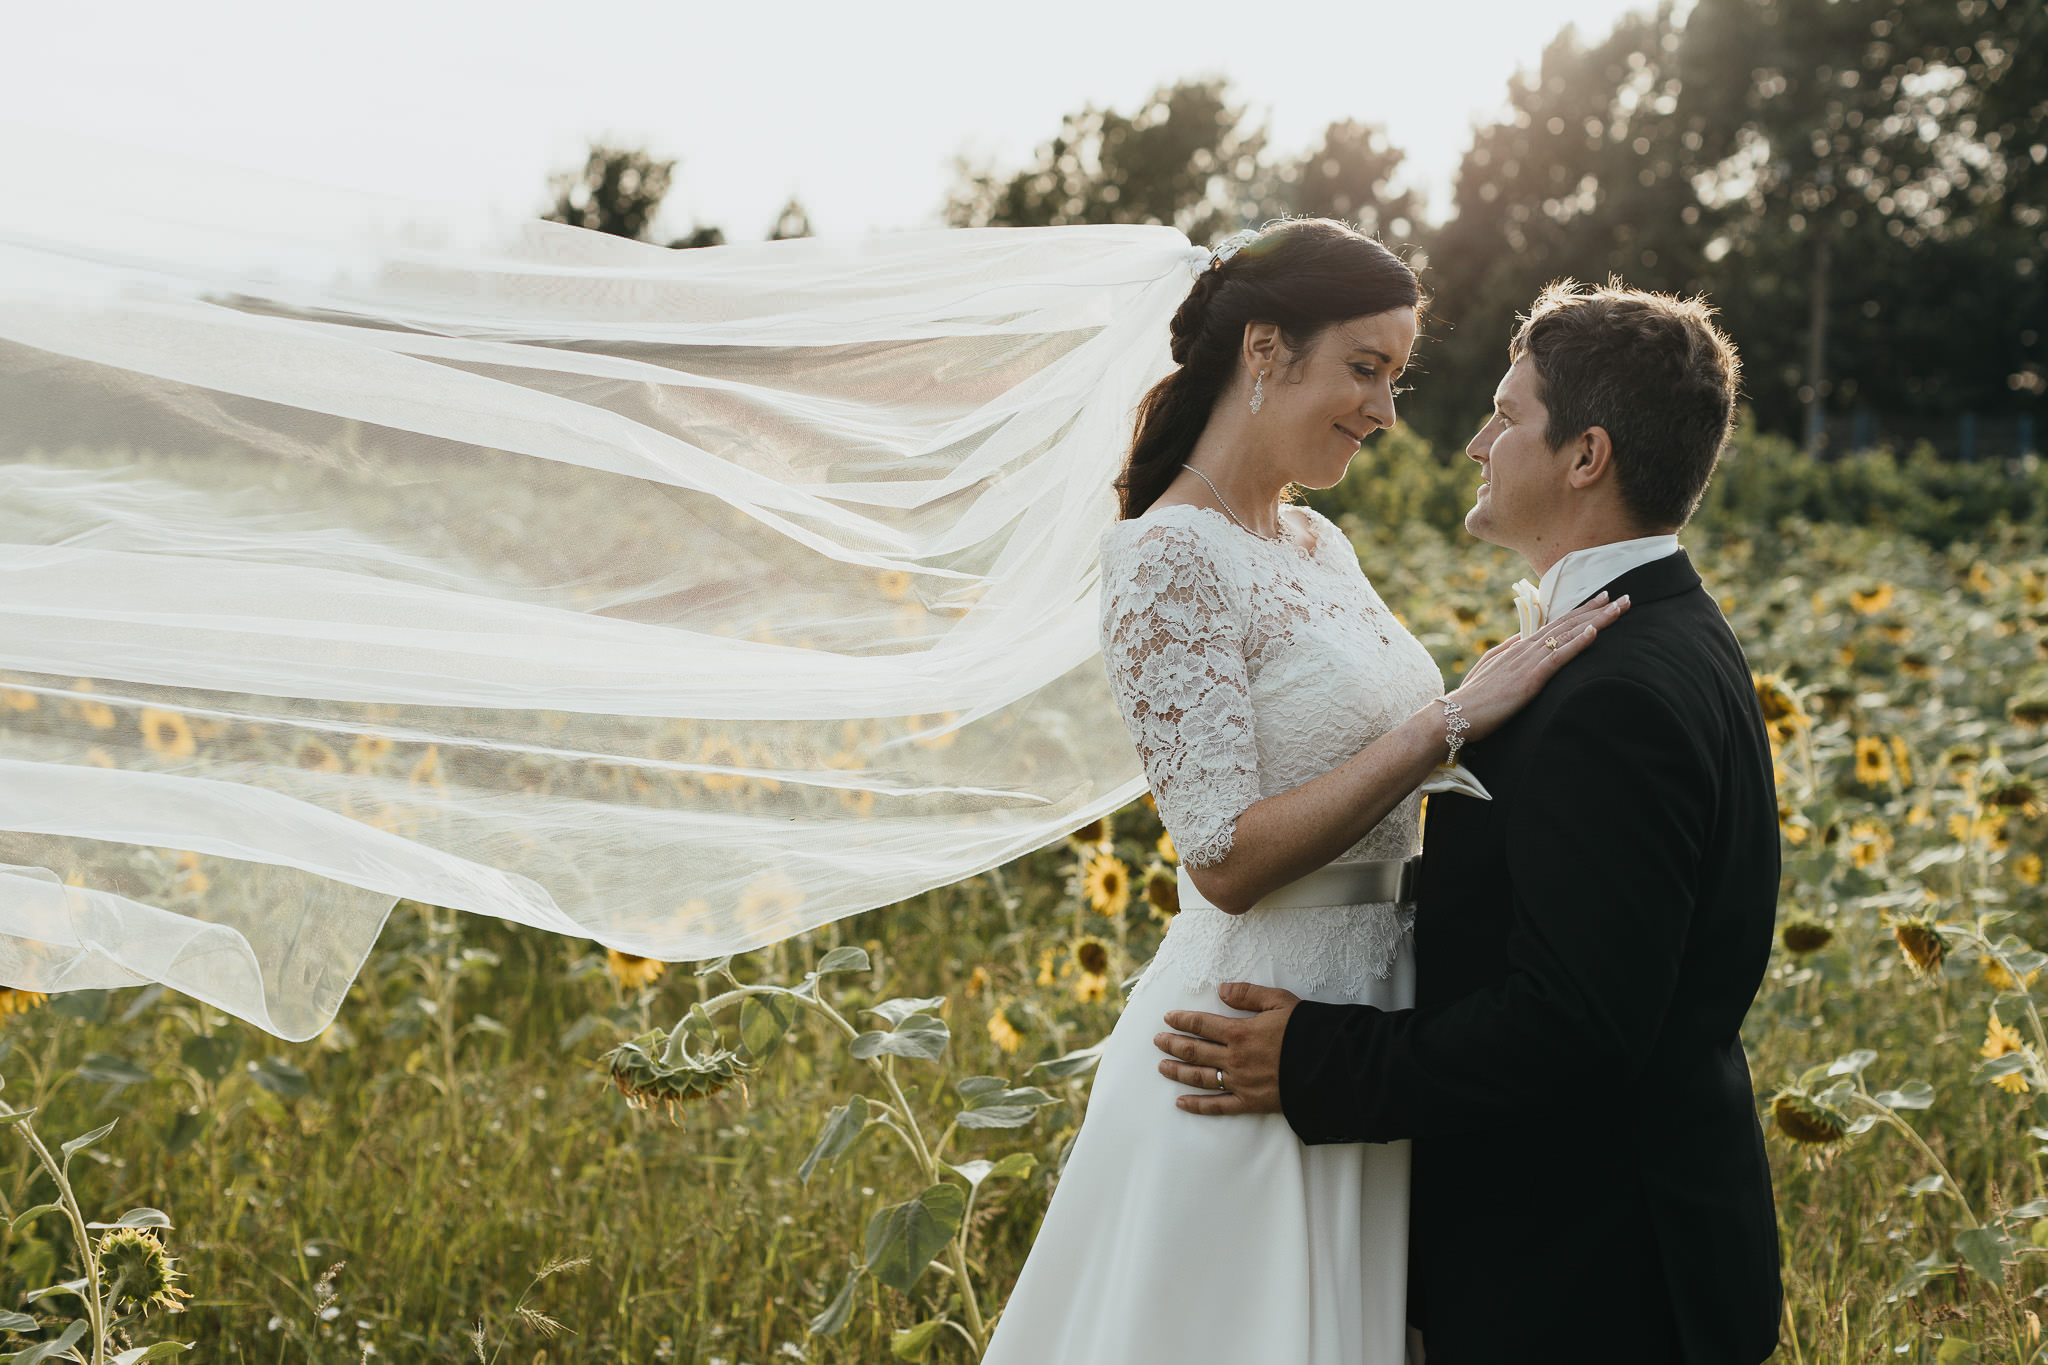 kubousfoto_svatebni_fotograf_brno_wedding_photo_MG_1992